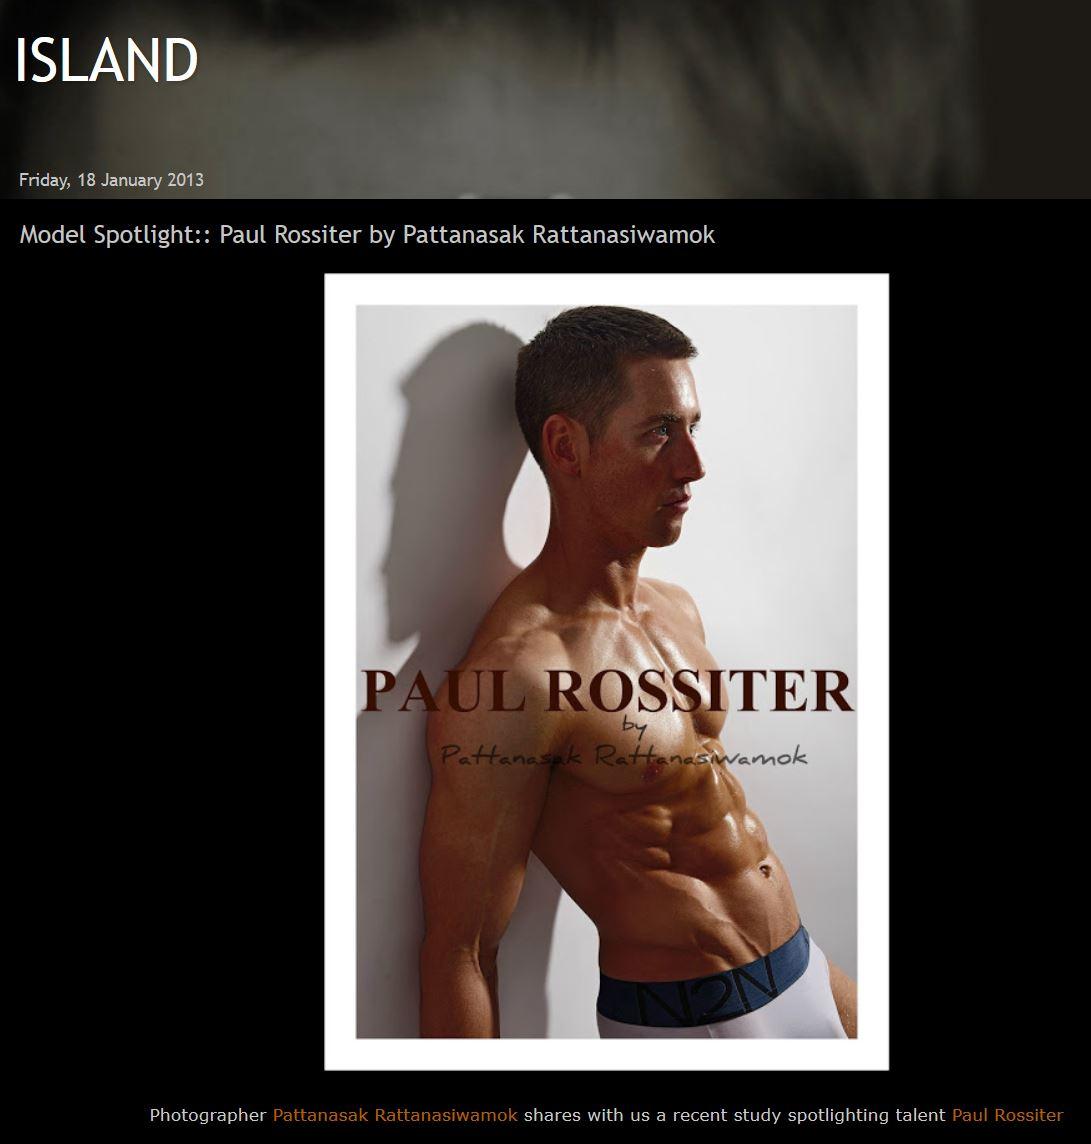 Paul - Come to Island